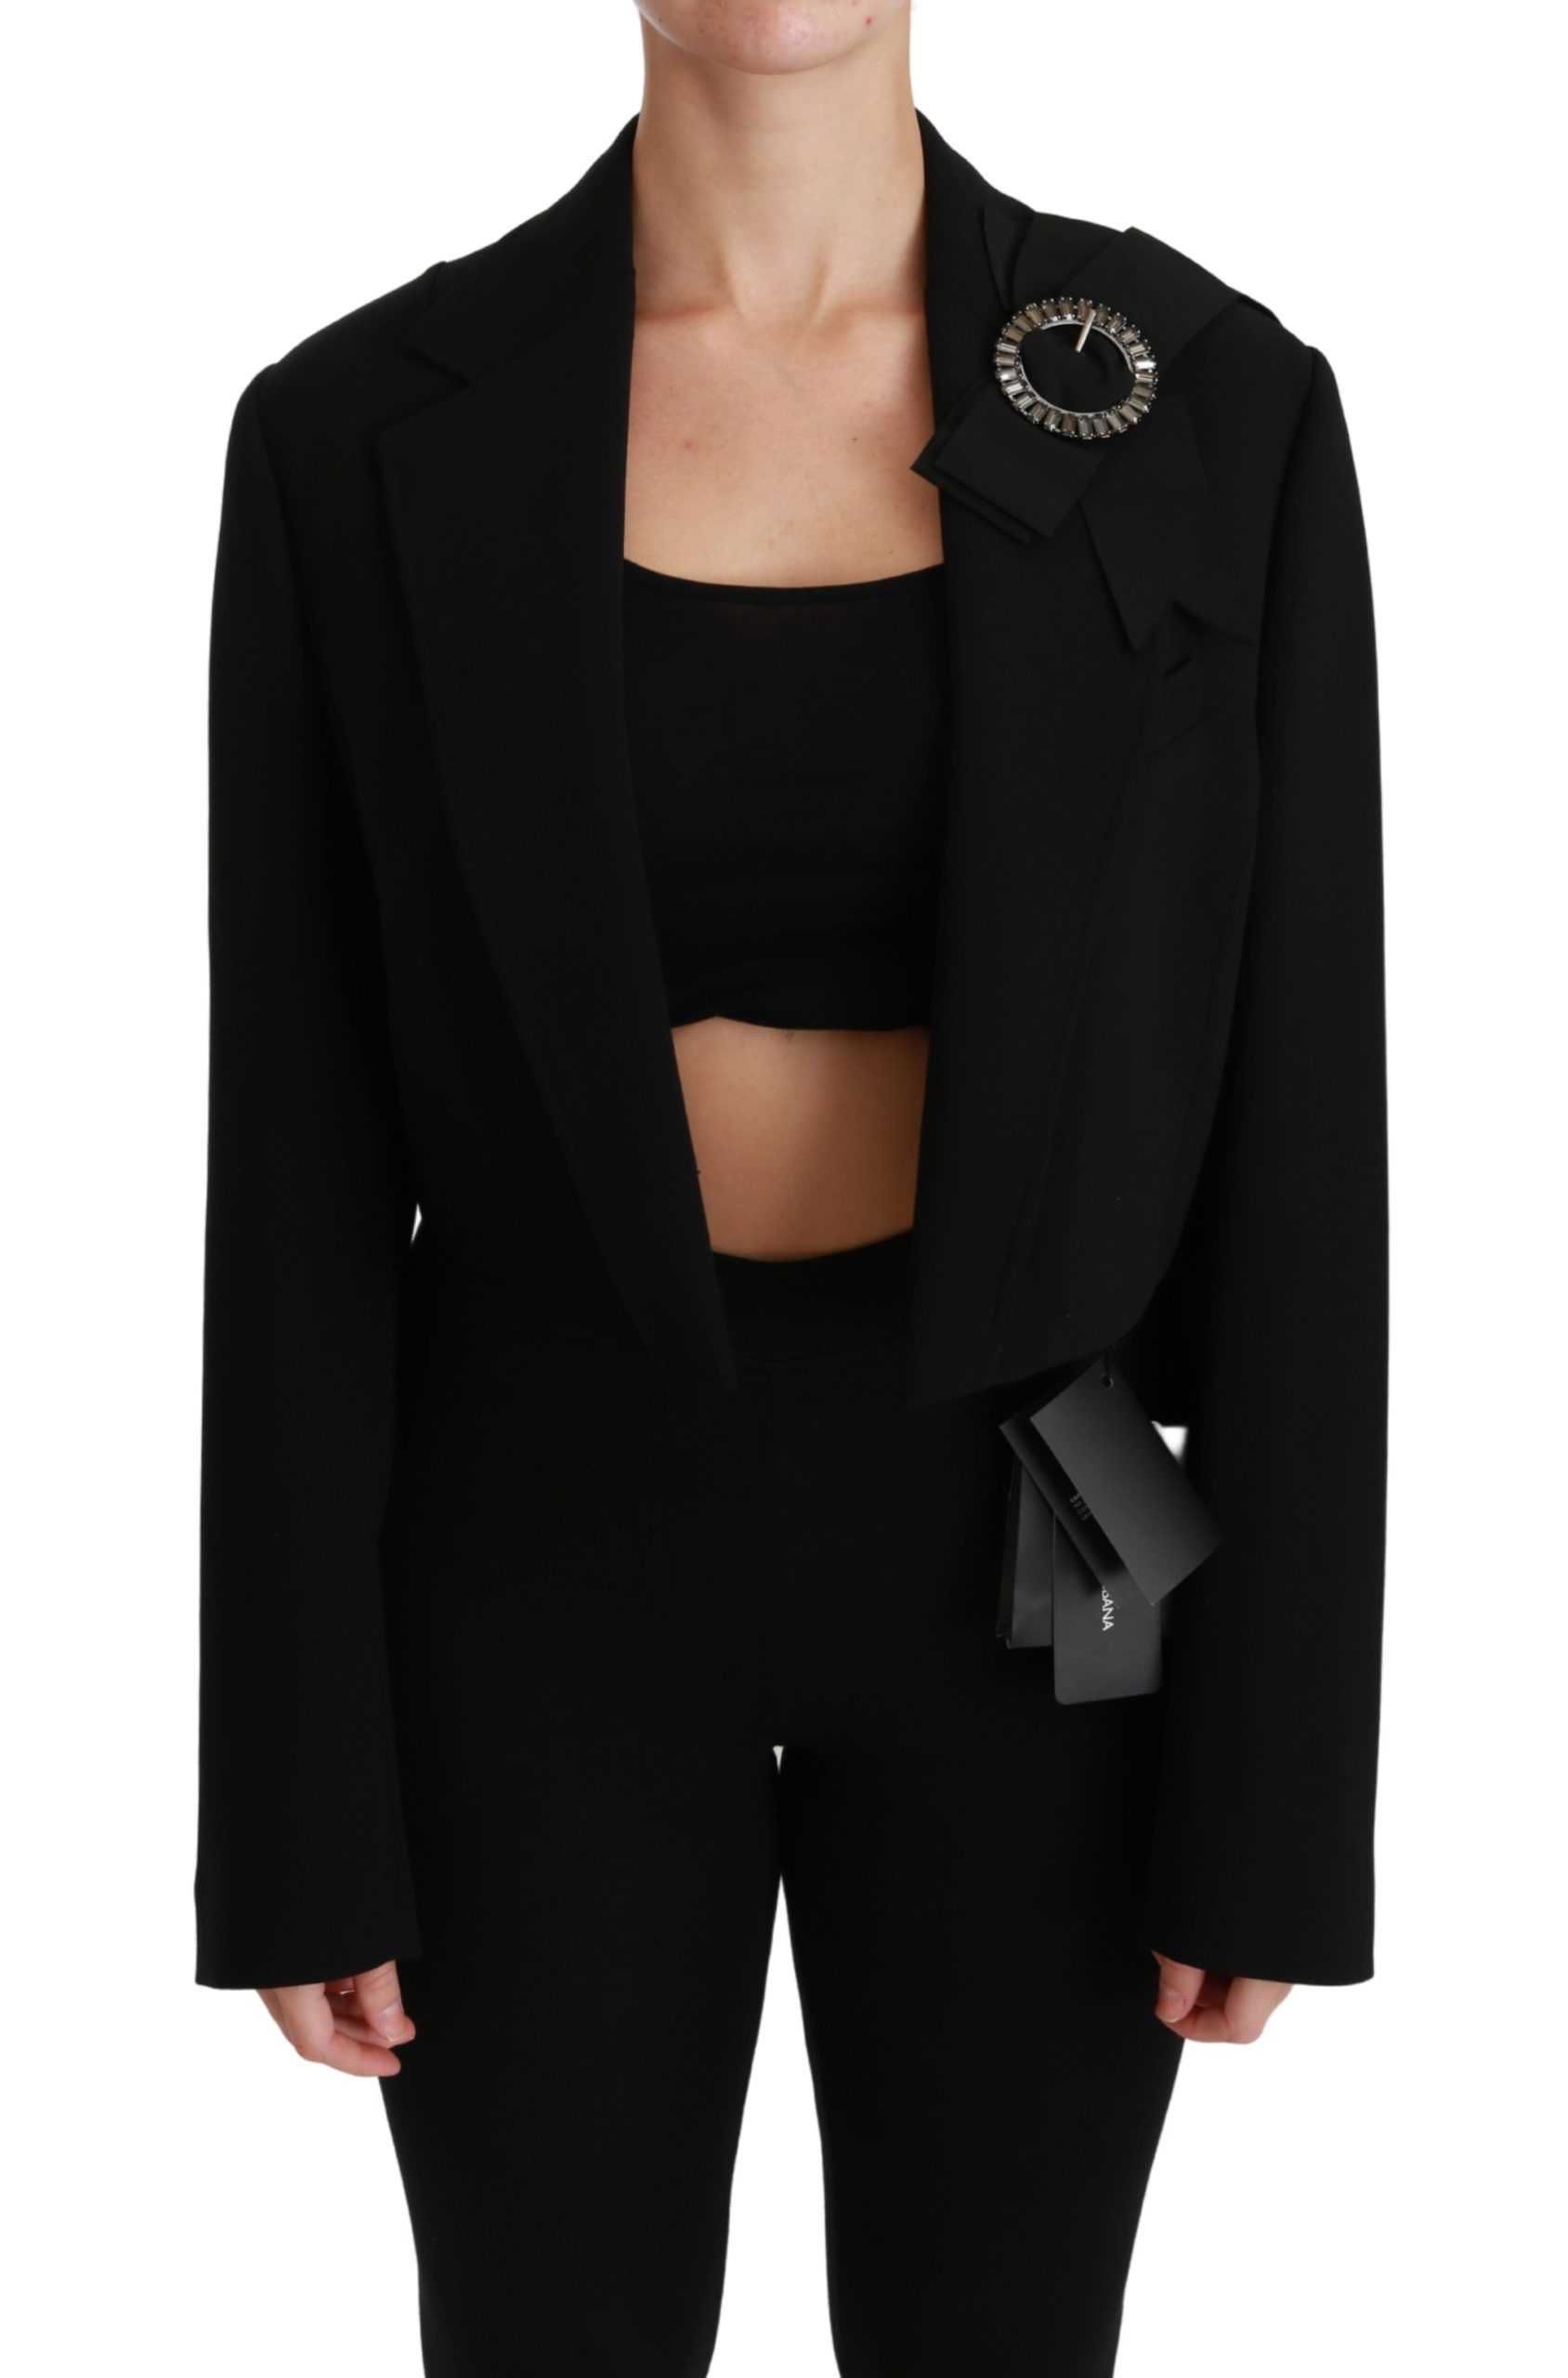 Dolce & Gabbana Women's Cropped Wool Stretch Blazer Black JKT2536 - IT44|L